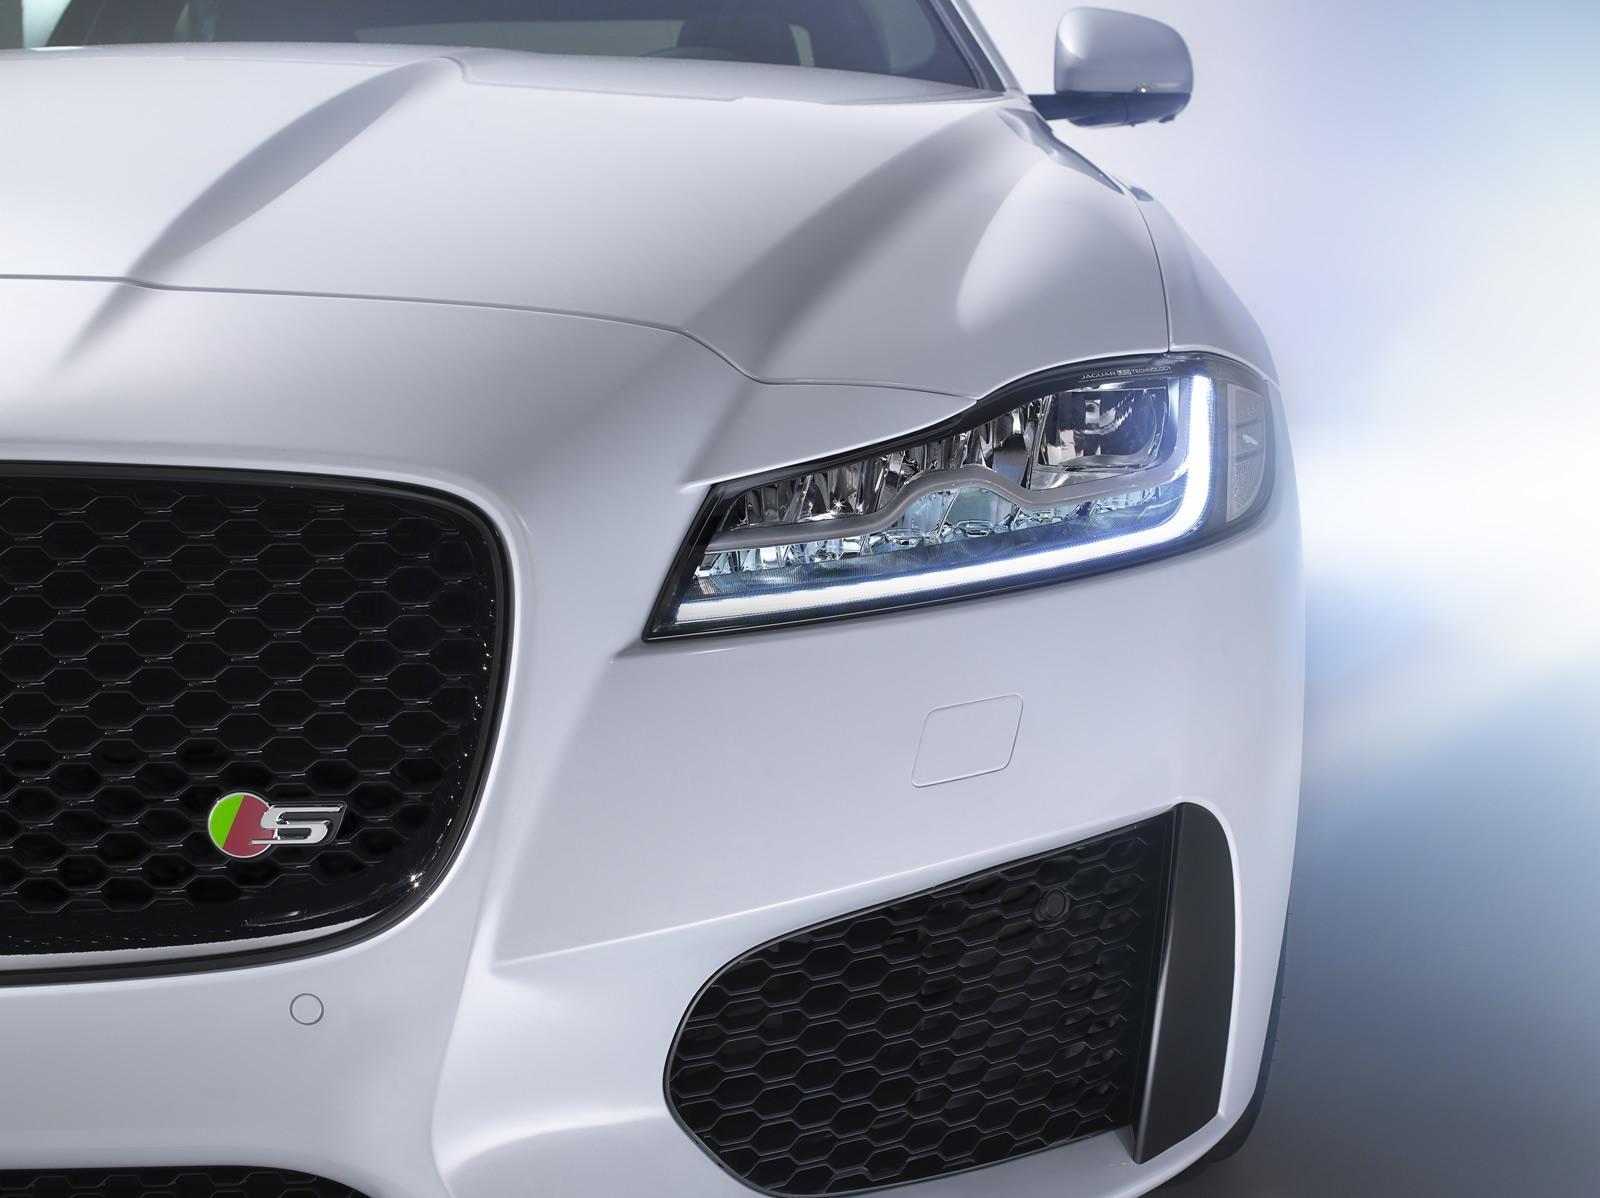 2016 Jaguar XF full LED headlamp official image